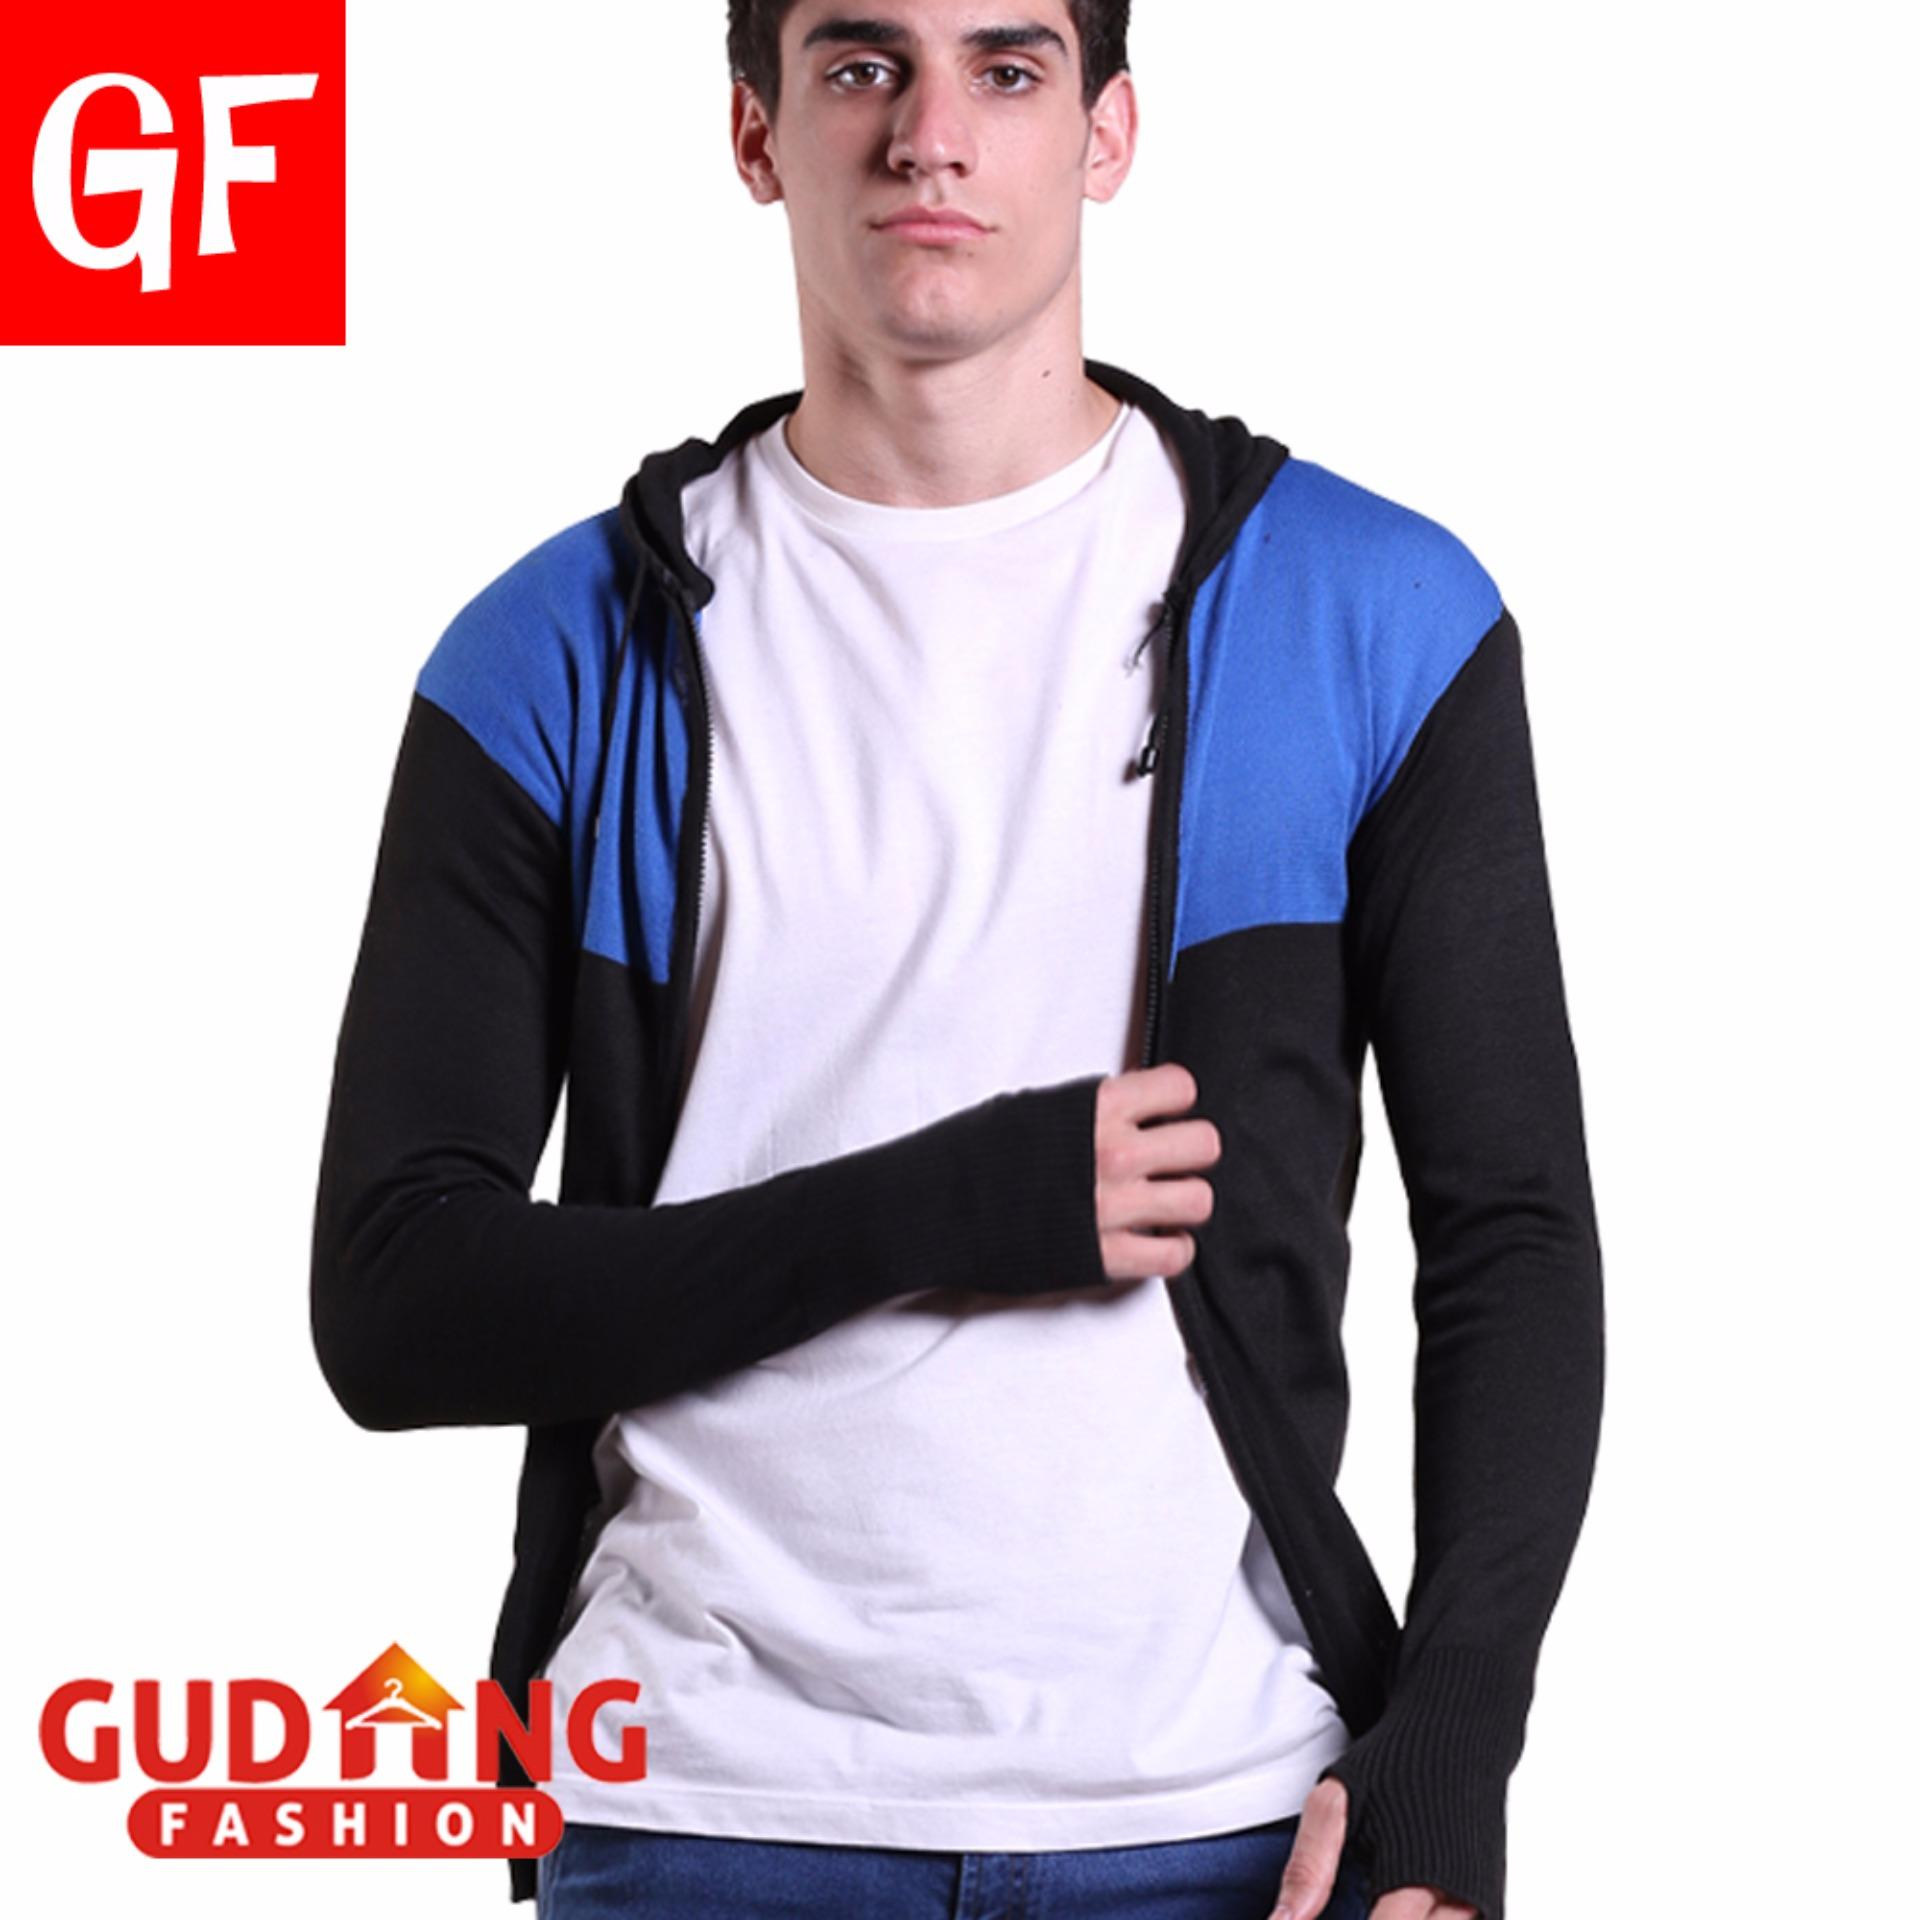 Gudang Fashion Sweater Jaket Pria Kombinasi Warna Original